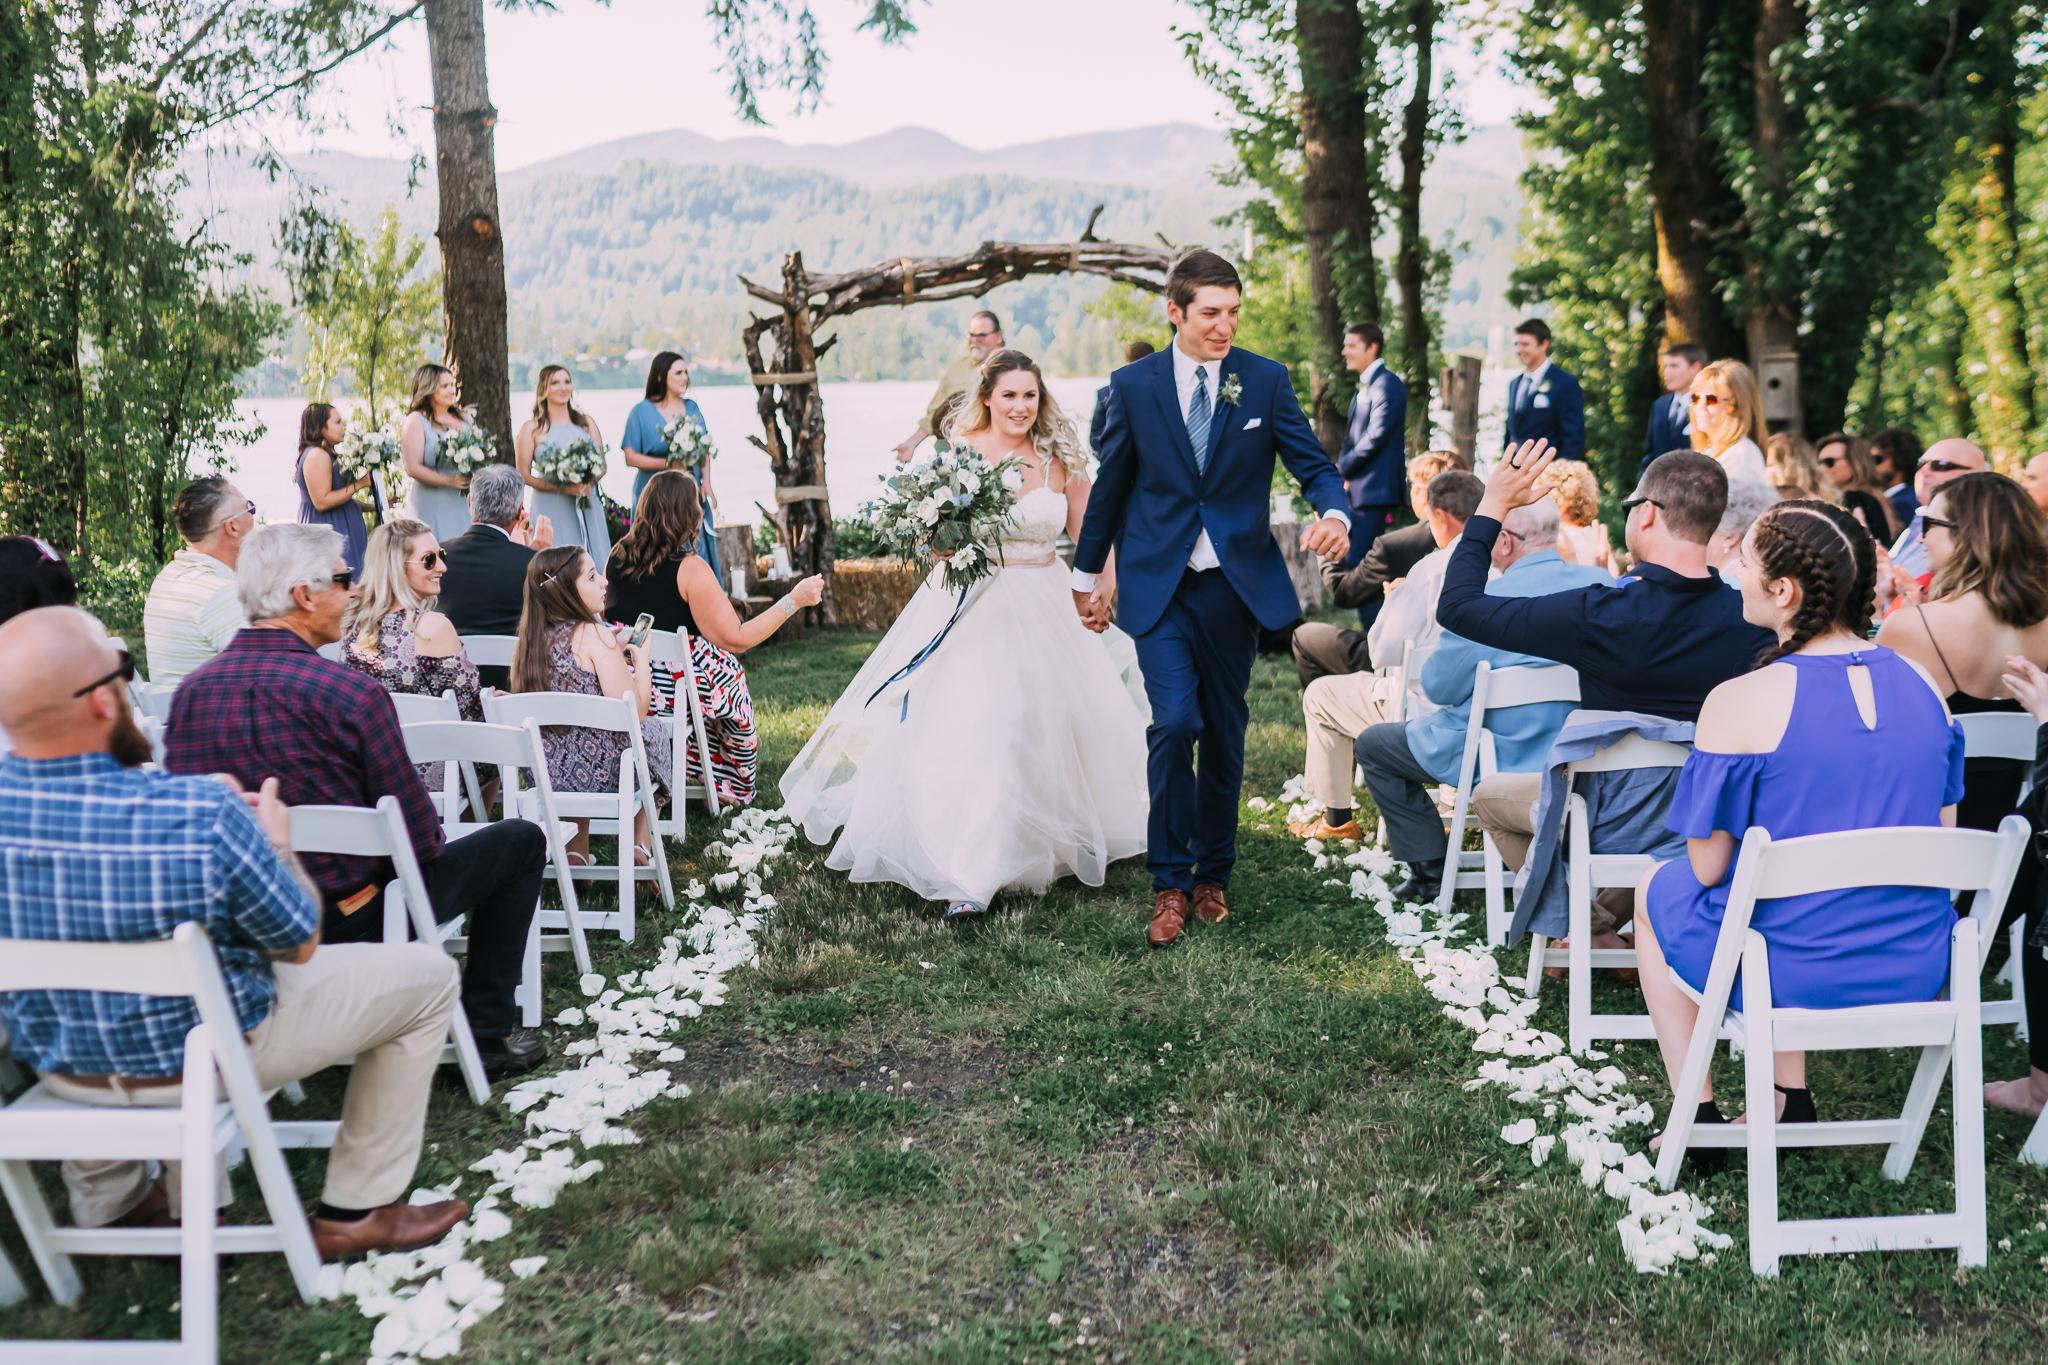 Bride Groom walk down aisle backyard wedding photography Mt Hood River Gorge Wedding Photographer